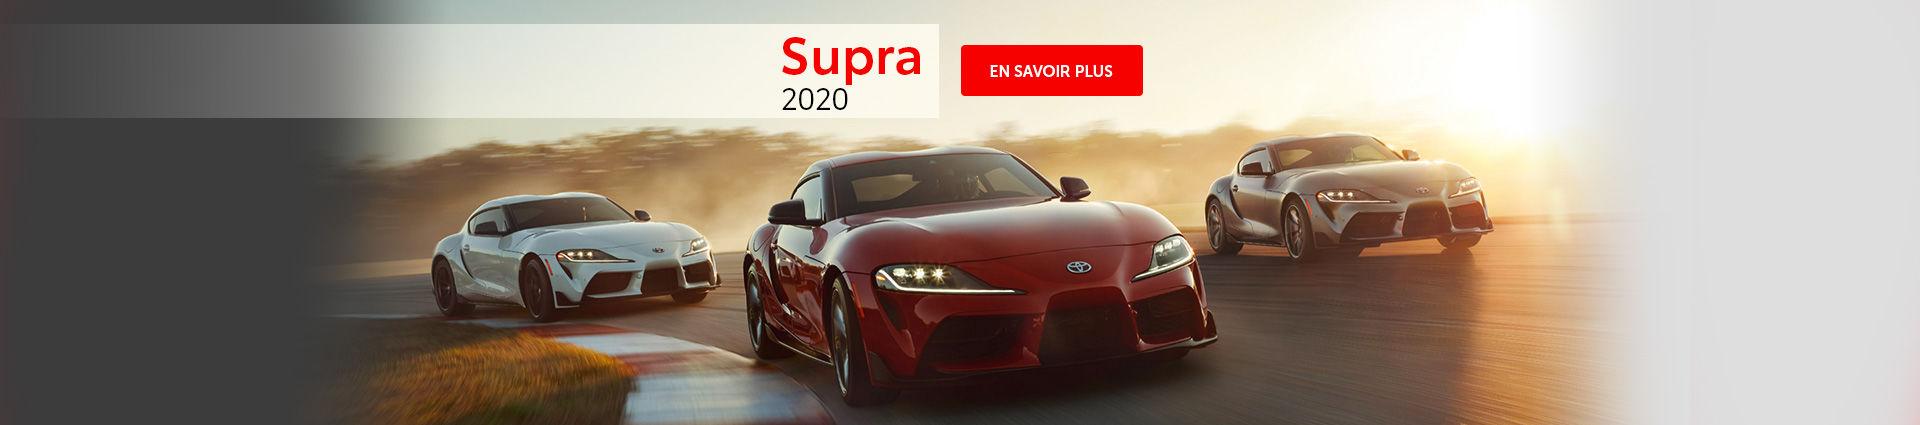 Supra 2020